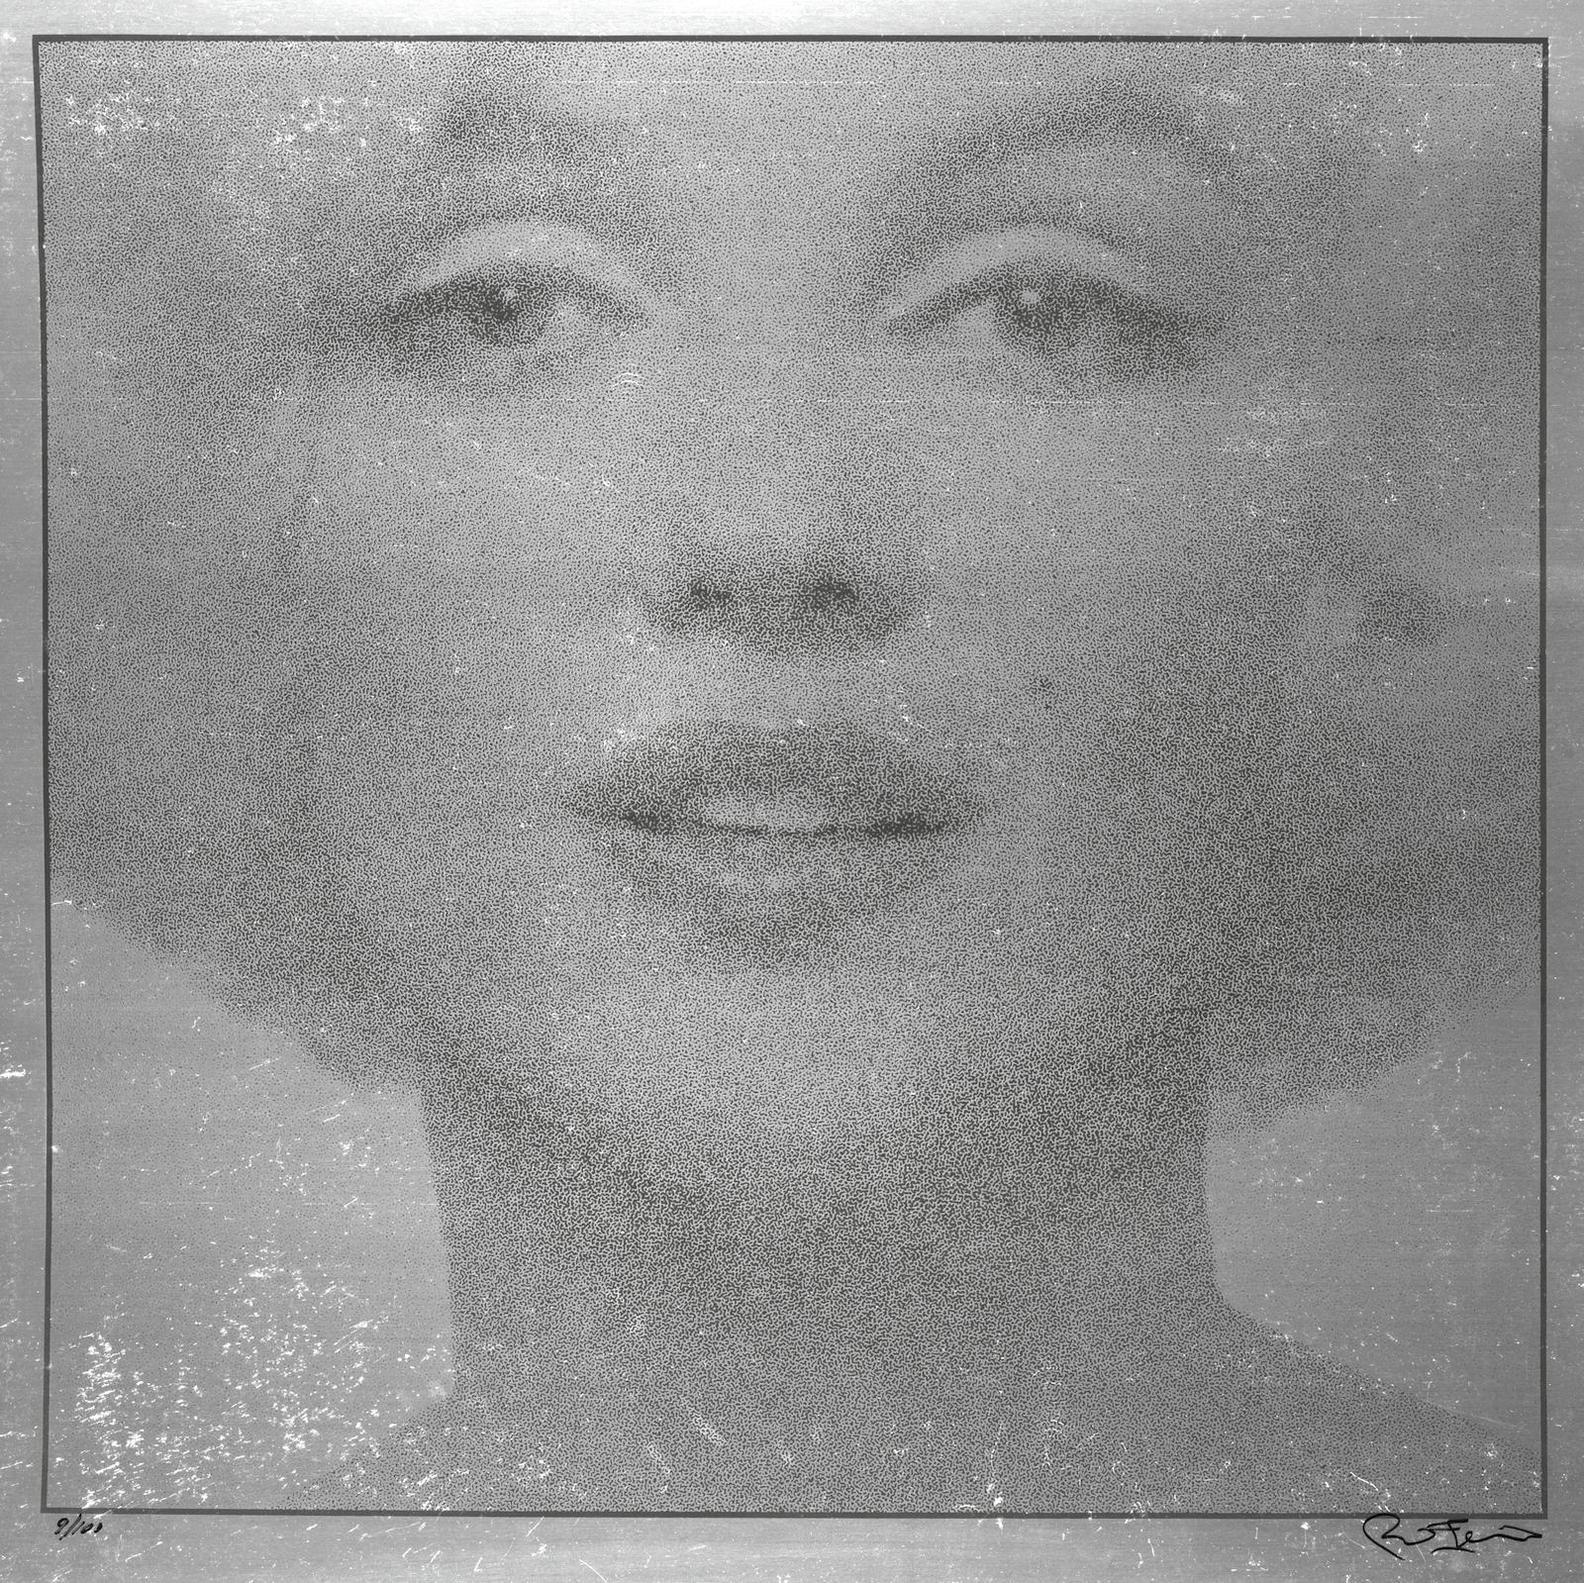 Bert Stern-Marilyn Monroe-